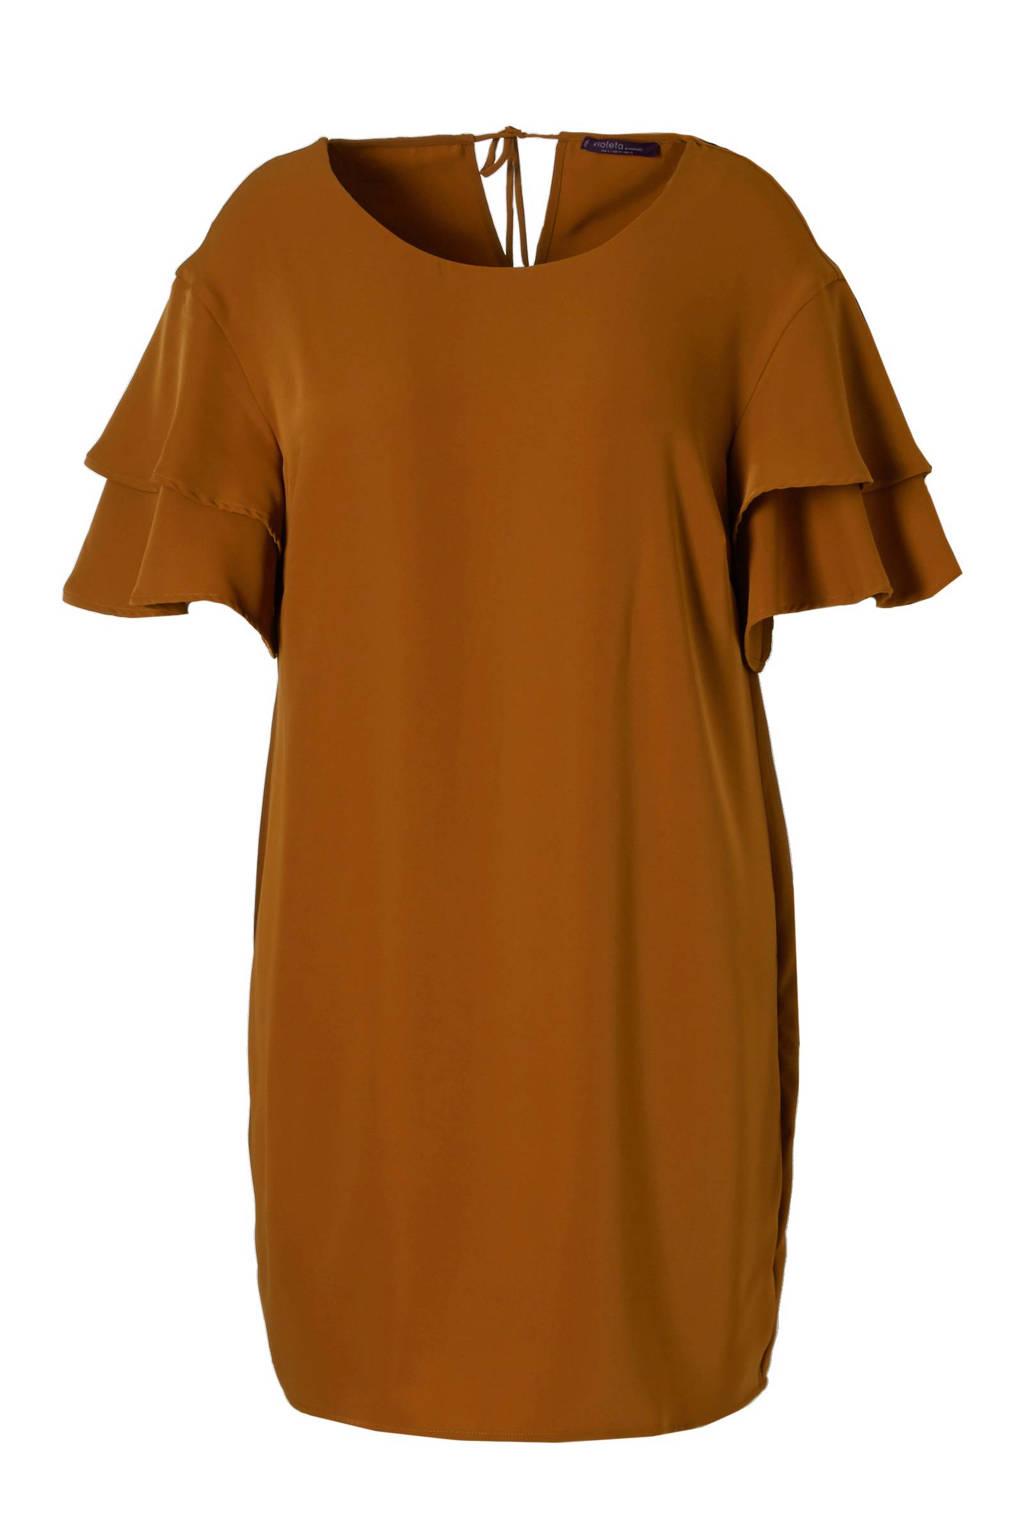 Violeta by Mango jurk met volantmouwen, Brique